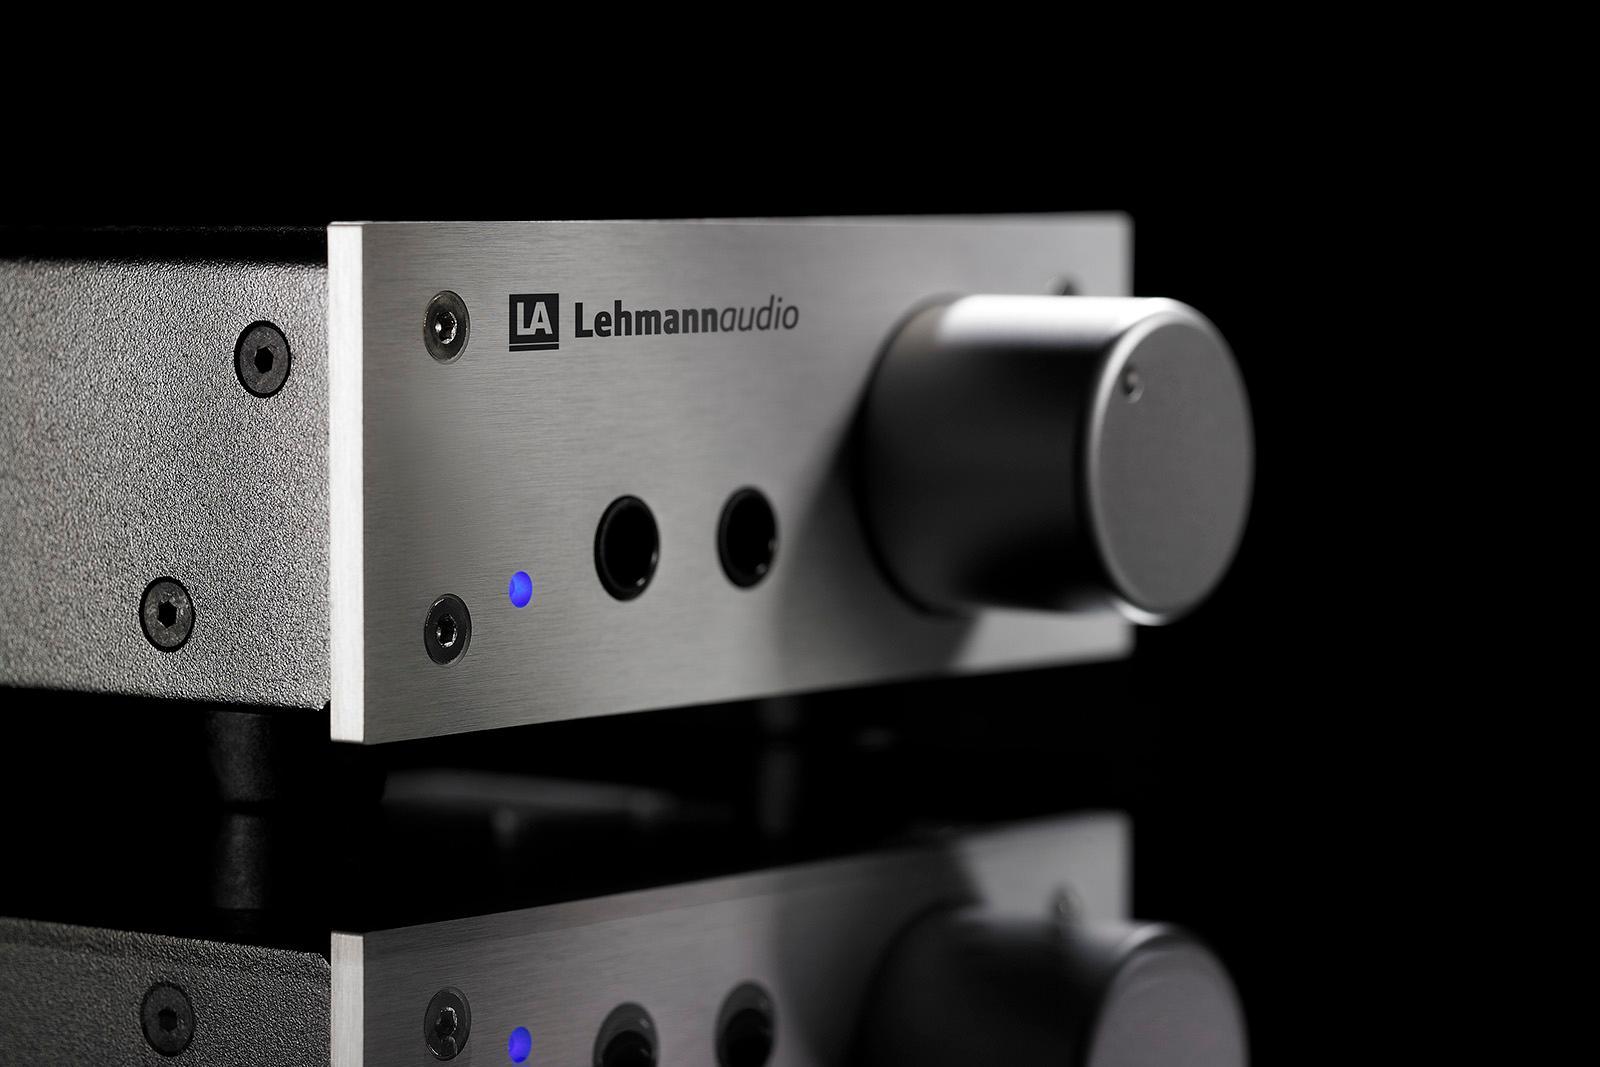 Lehmannaudio's Linear USB II headphone amp/DAC/preamp is a minimalist gem that sounds incredible.